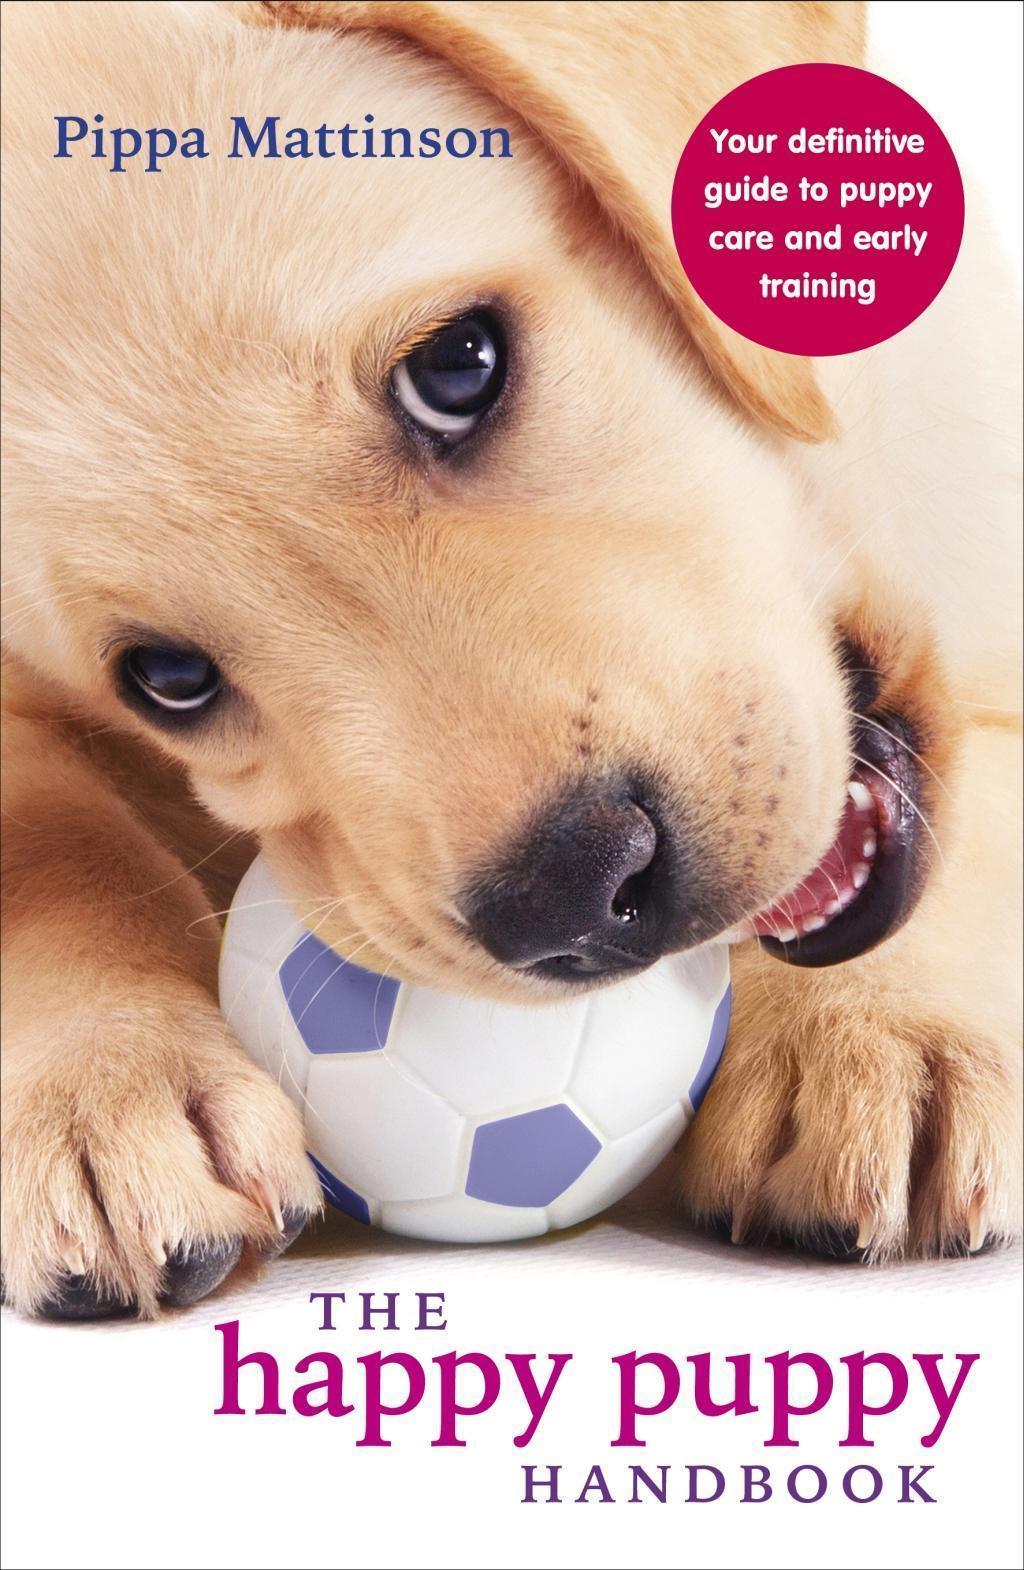 The Happy Puppy Handbook